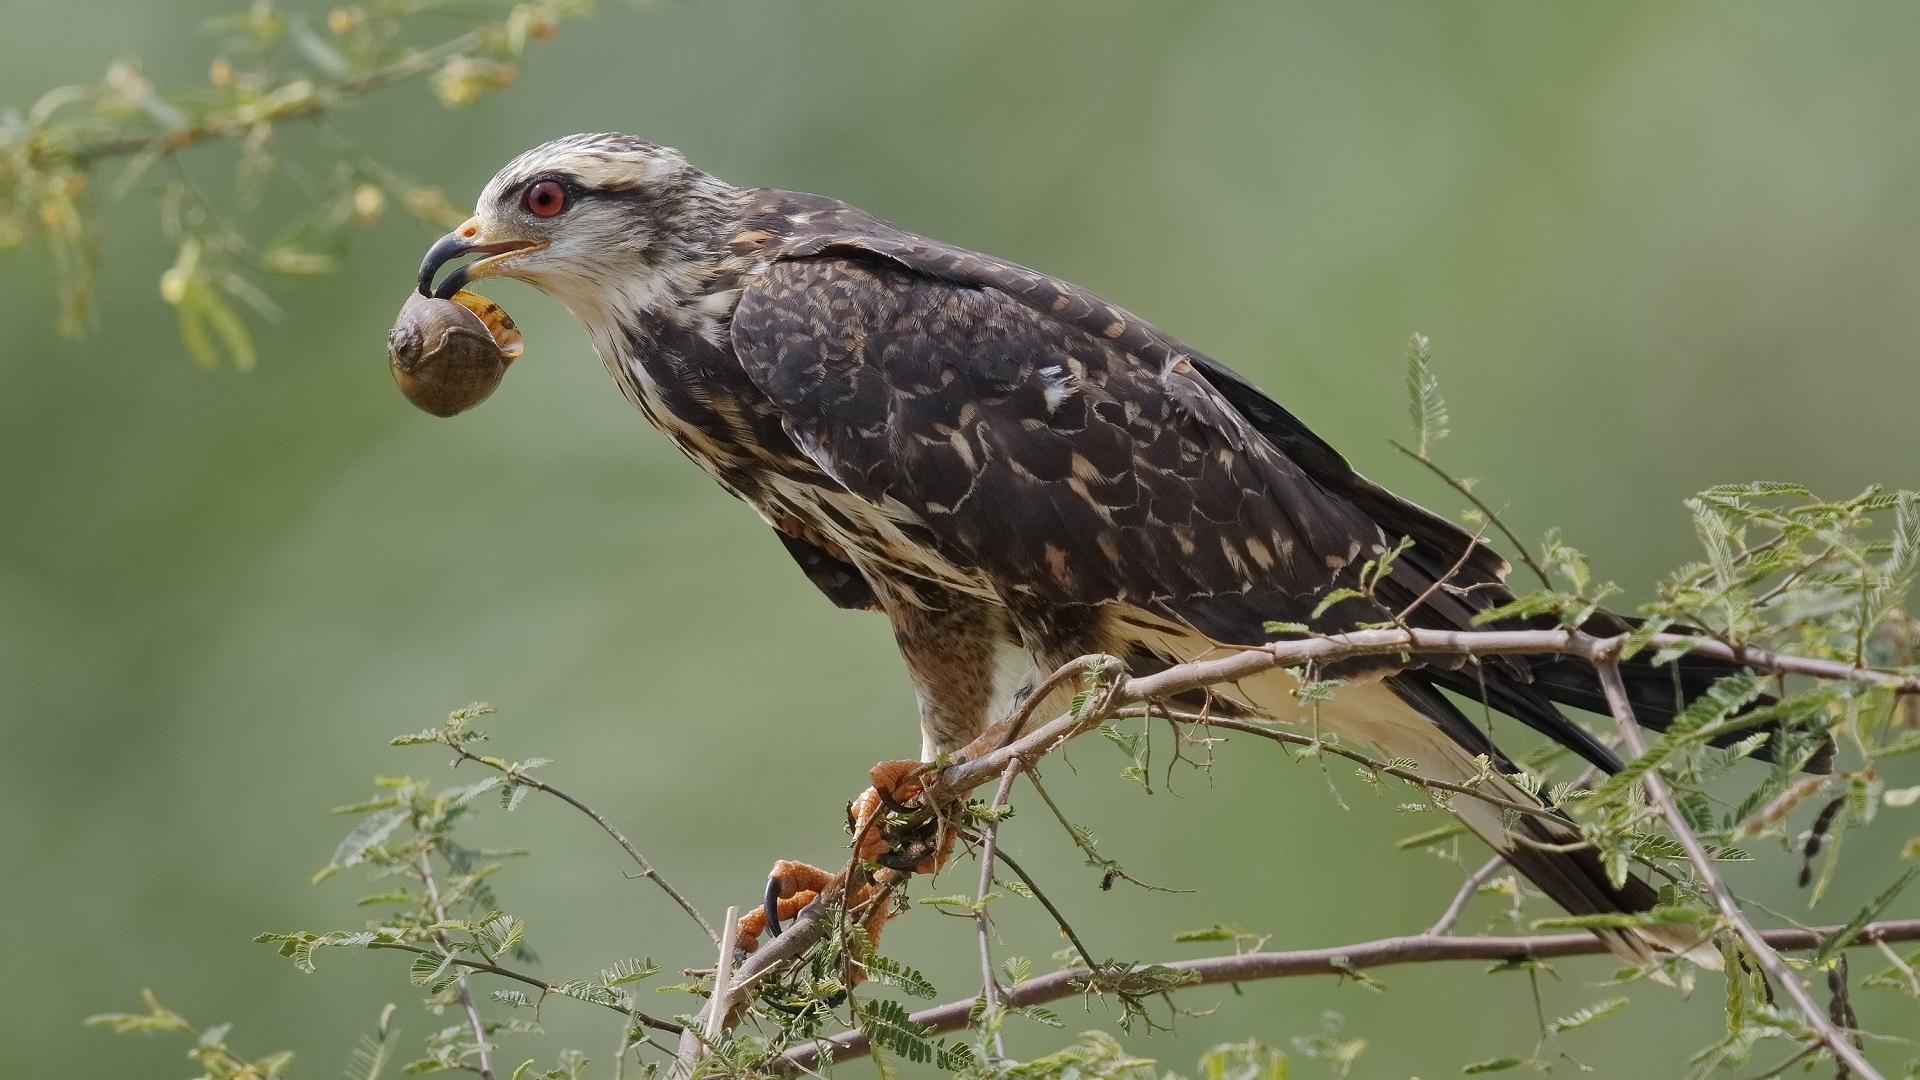 Mláďata s velkými ptáky